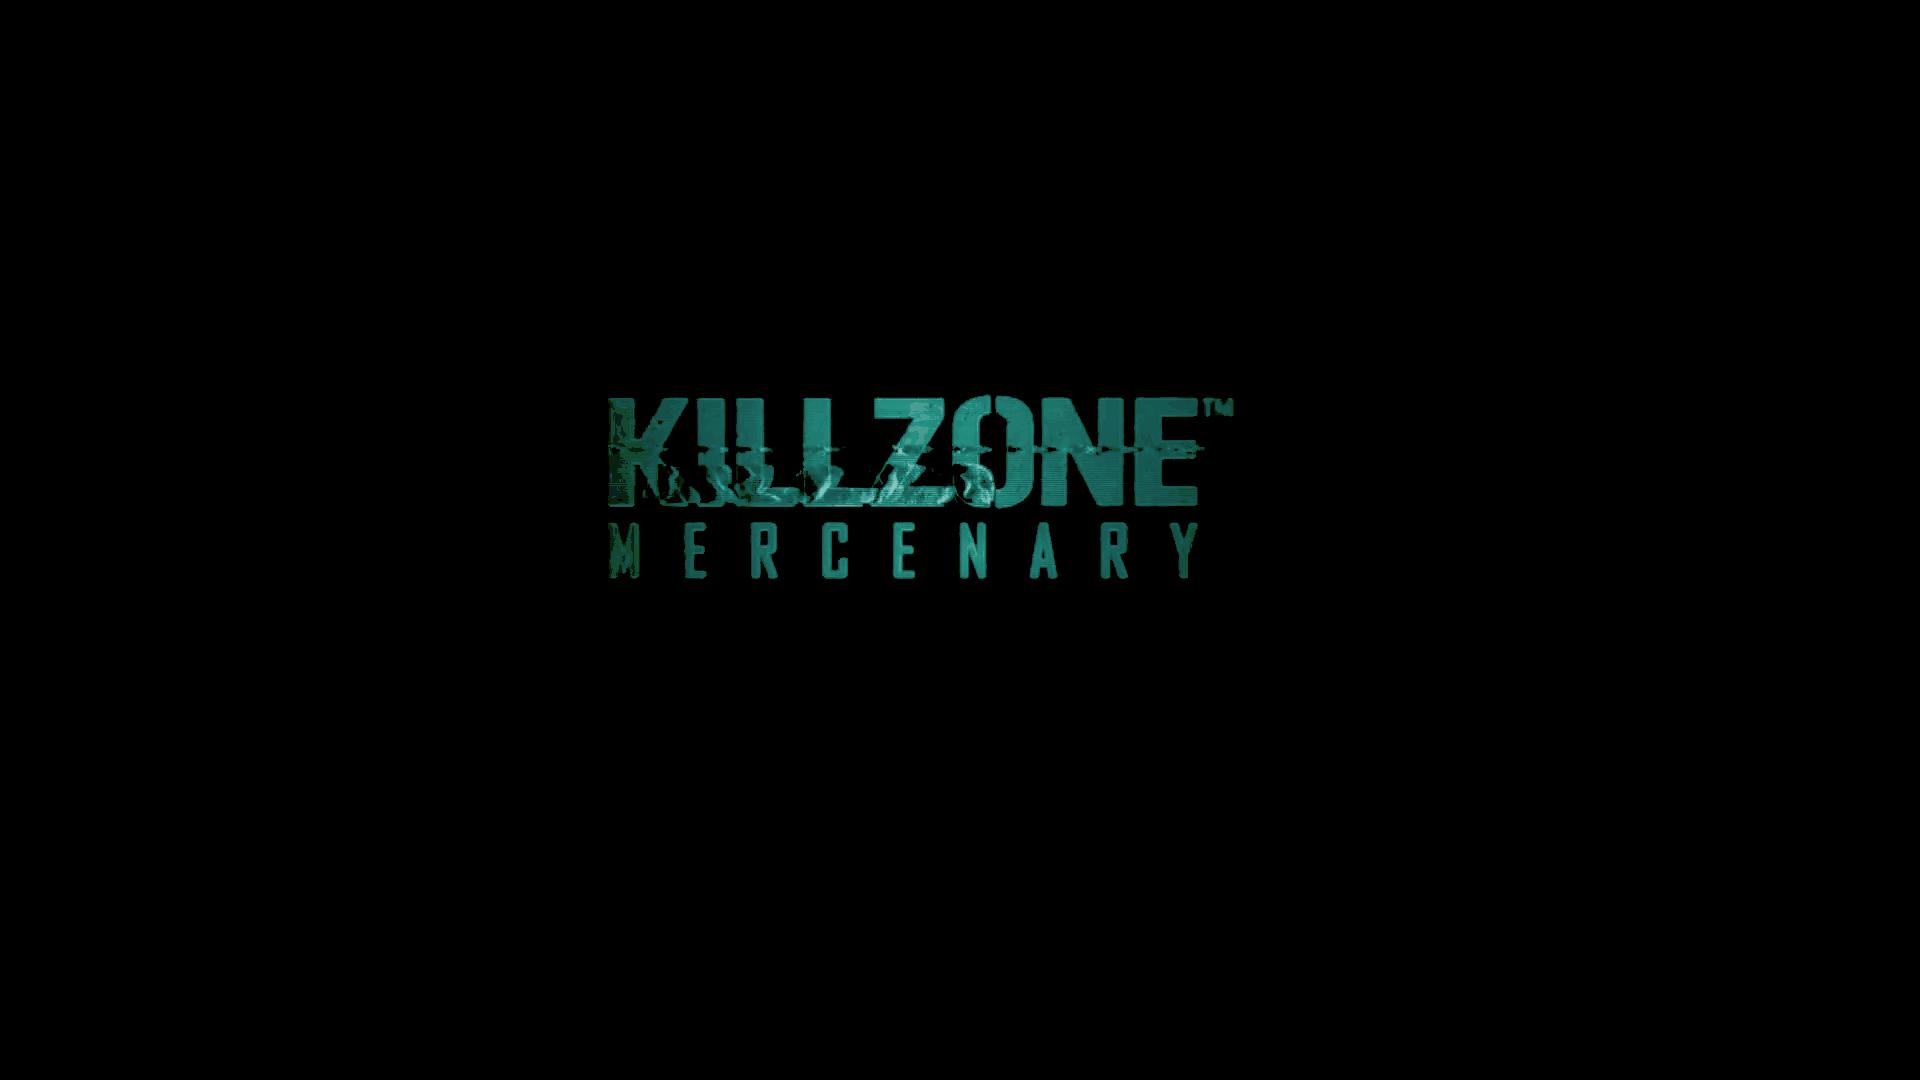 Killzone Mercenary wallpaper 3